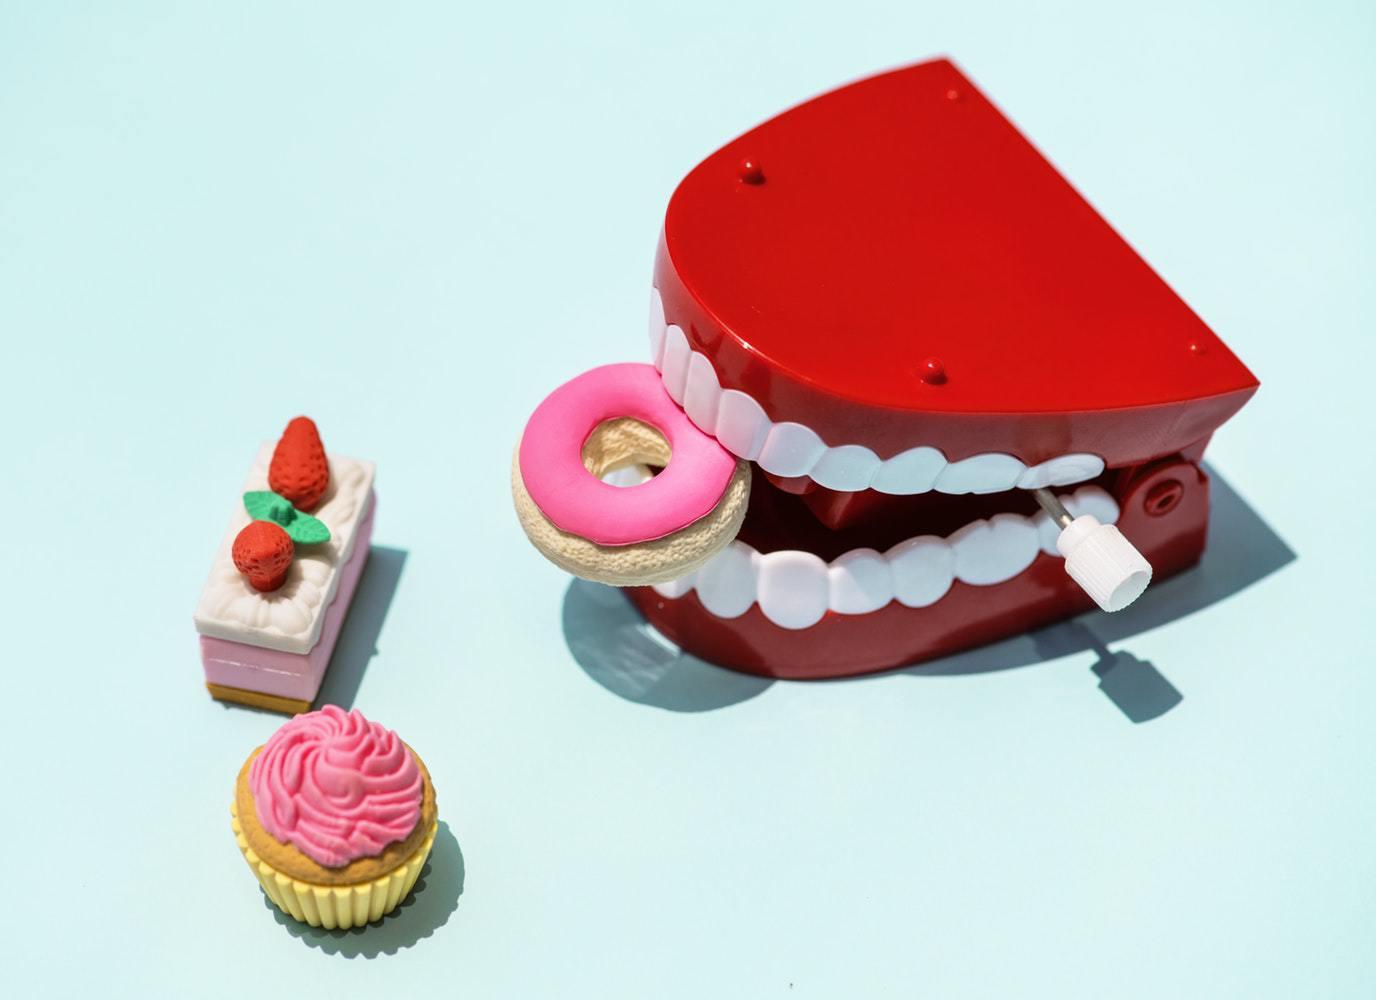 edible dosage